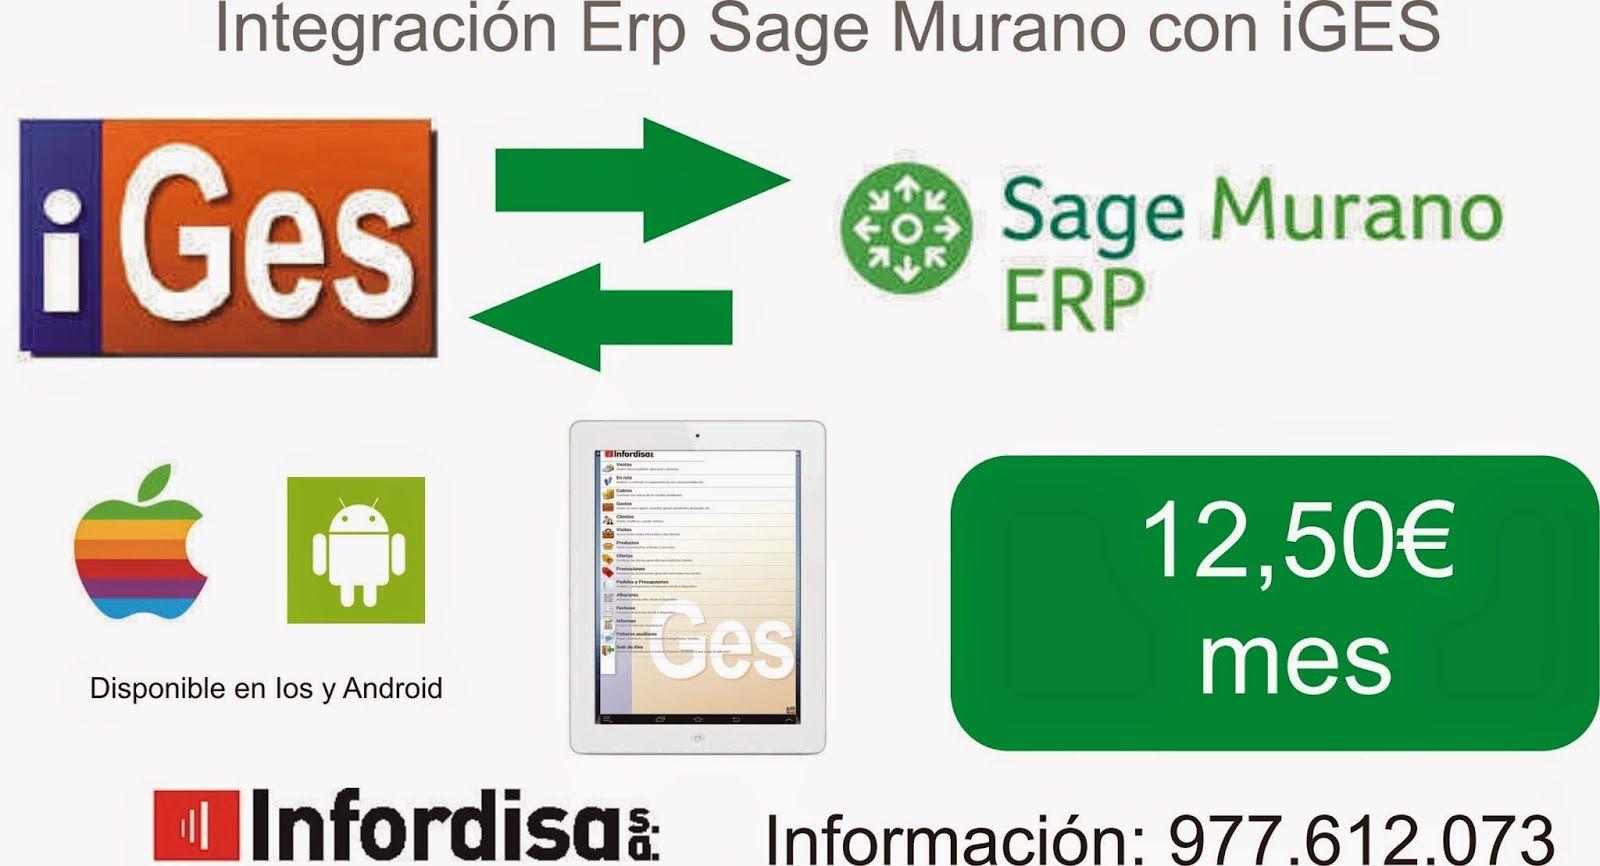 iGes aplicación de preventa sobre Ipad o Android con conector para Erp Sage Murano.